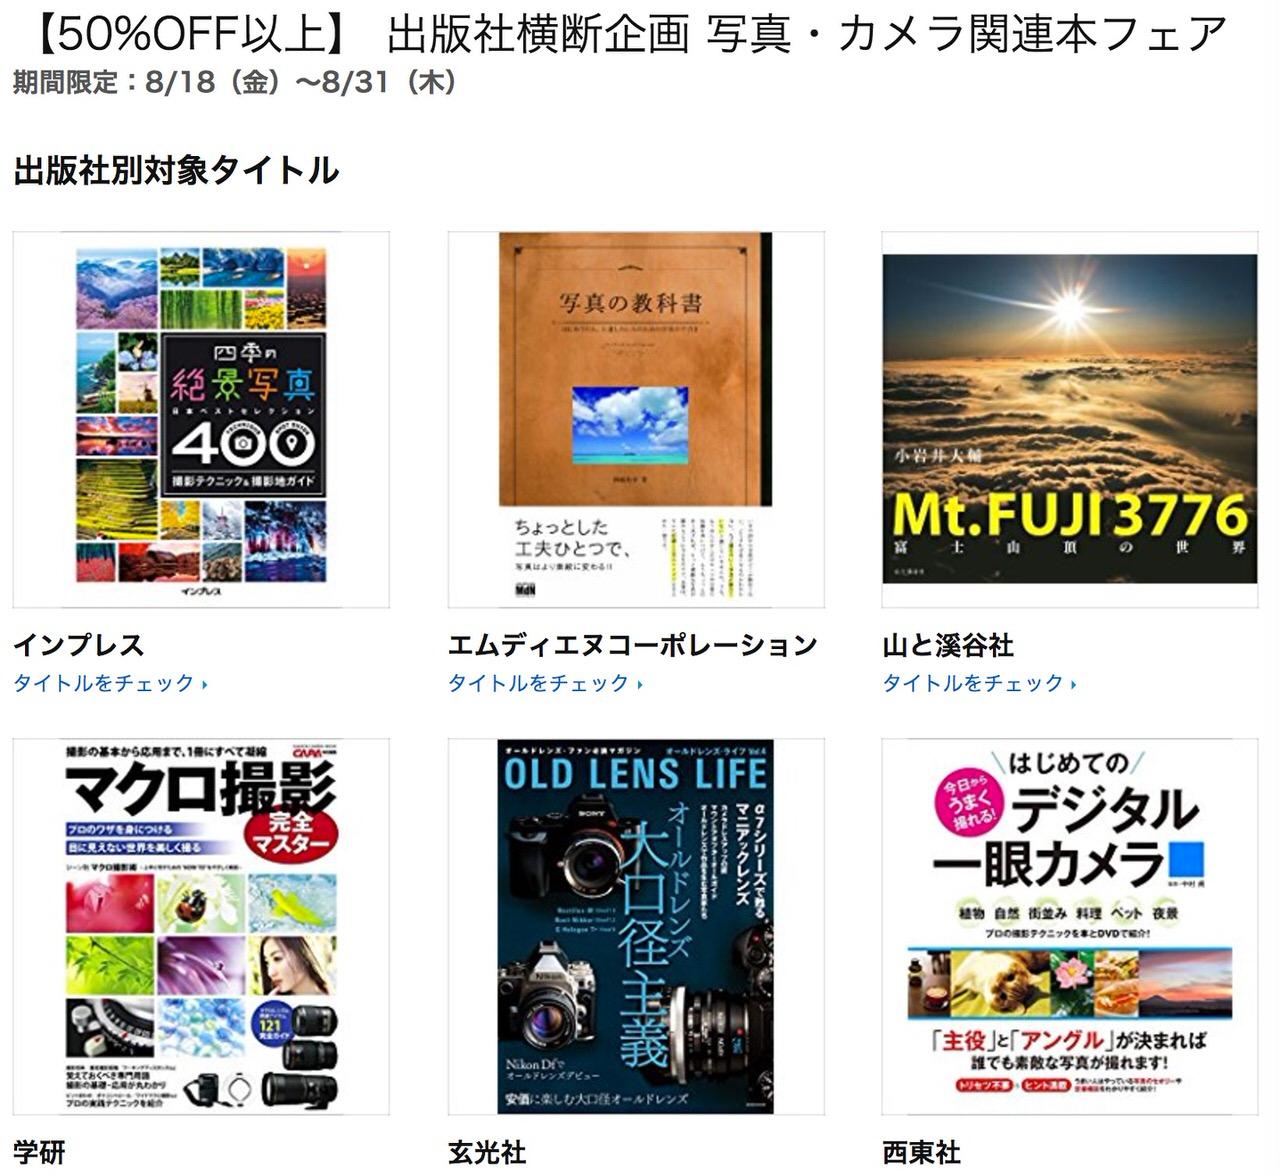 【Kindleセール】50%OFF以上「出版社横断企画写真・カメラ関連本フェア」(〜8/31)